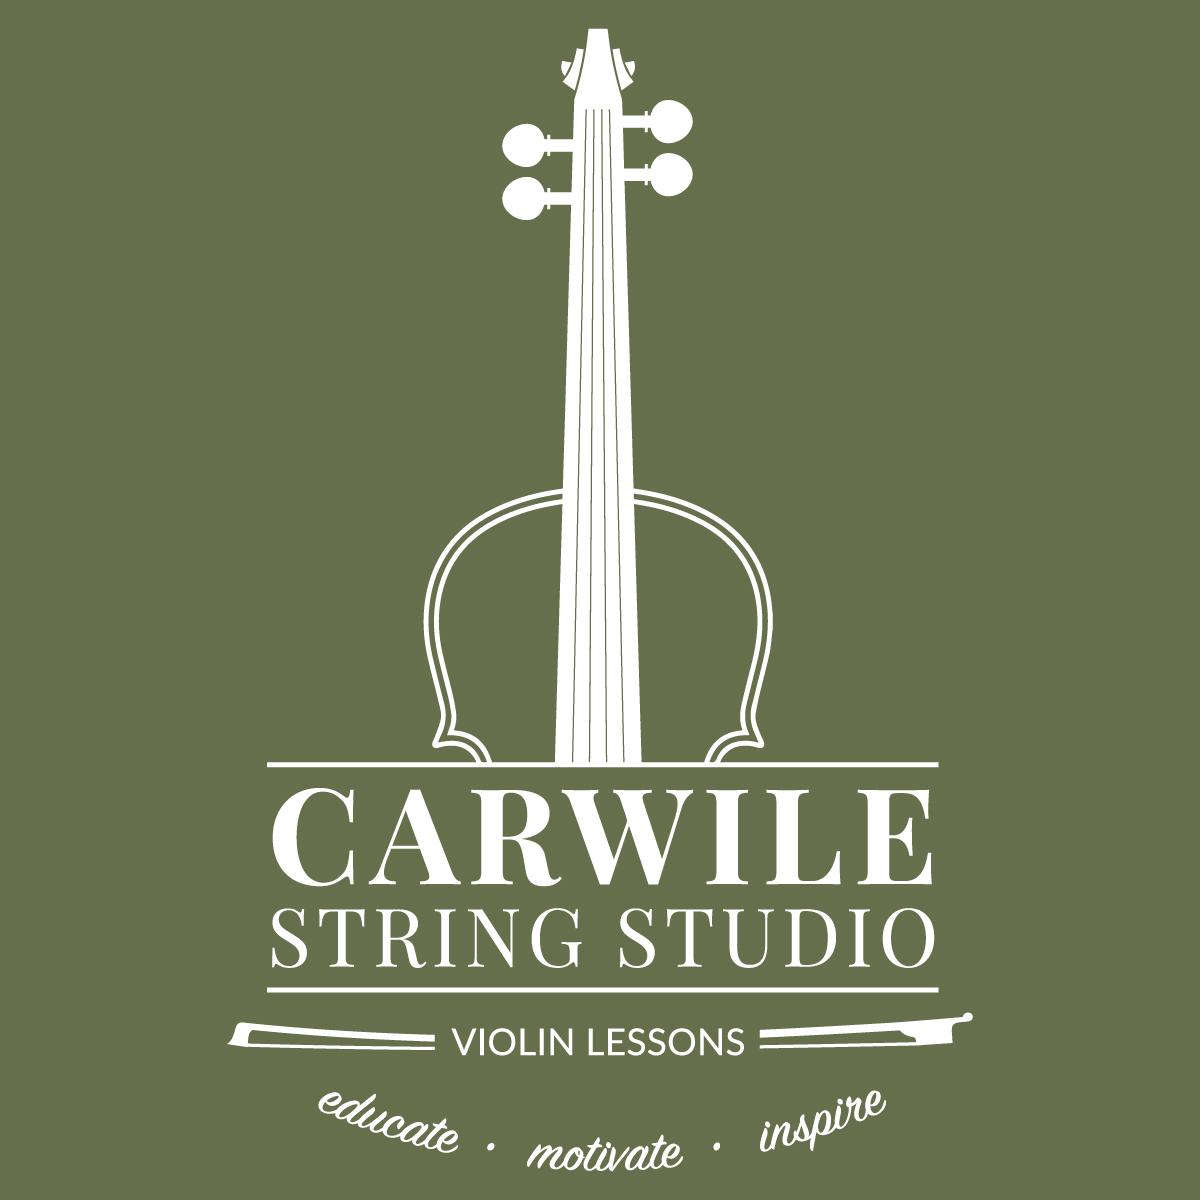 Carwile String Studio   Violin Lessons - Lexington, Kentucky